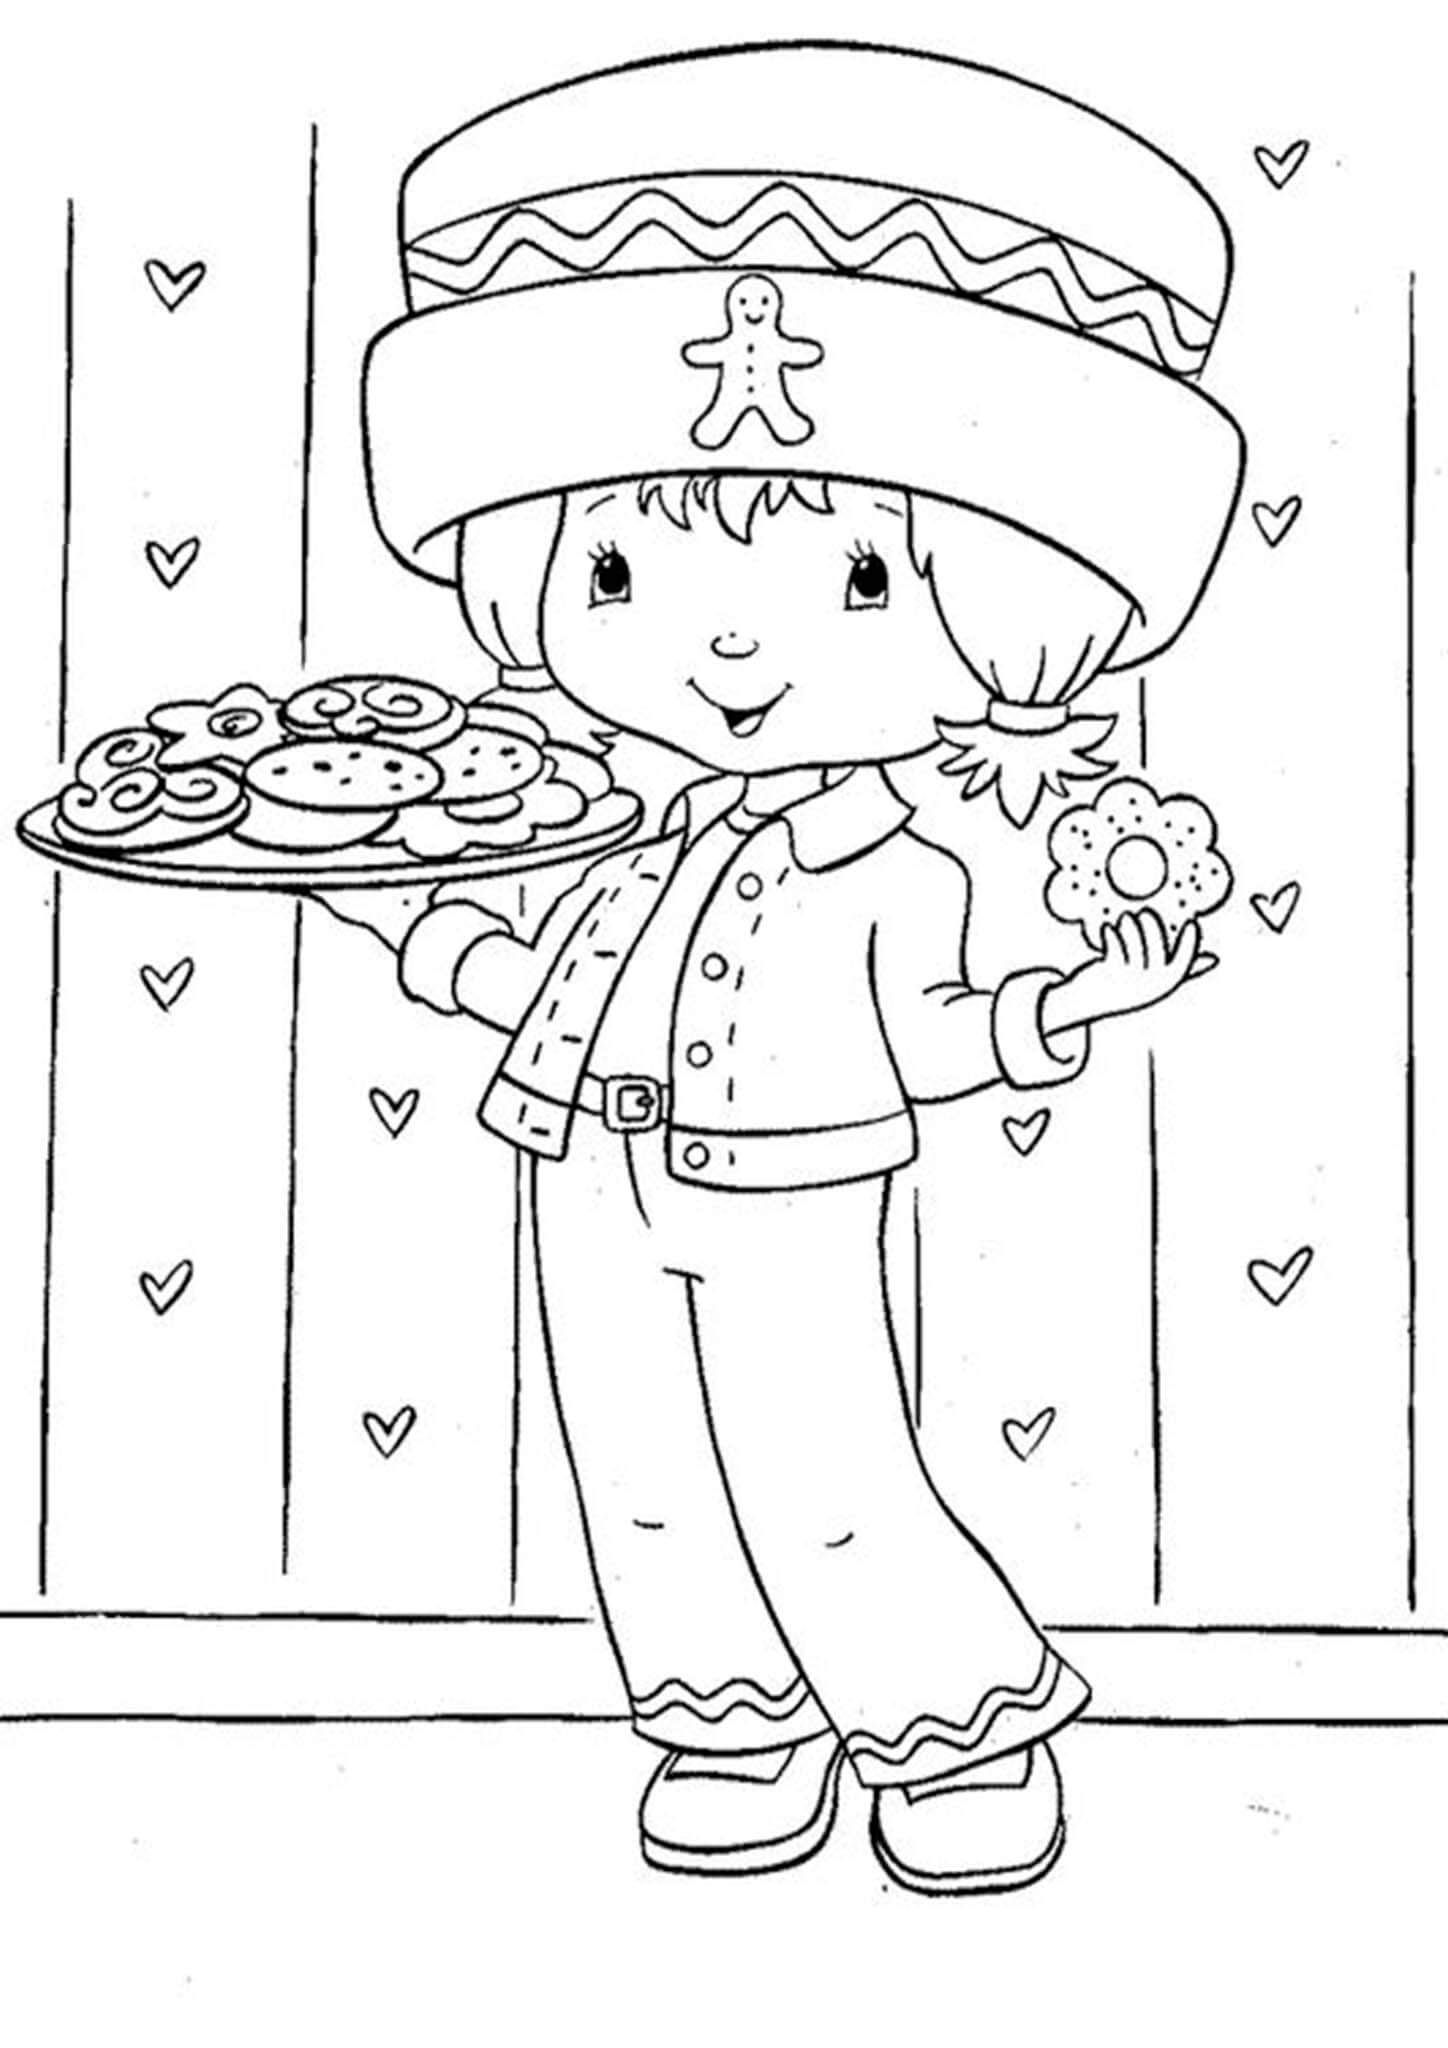 Free Easy To Print Strawberry Shortcake Coloring Pages In 2020 Strawberry Shortcake Coloring Pages Cool Coloring Pages Coloring Books